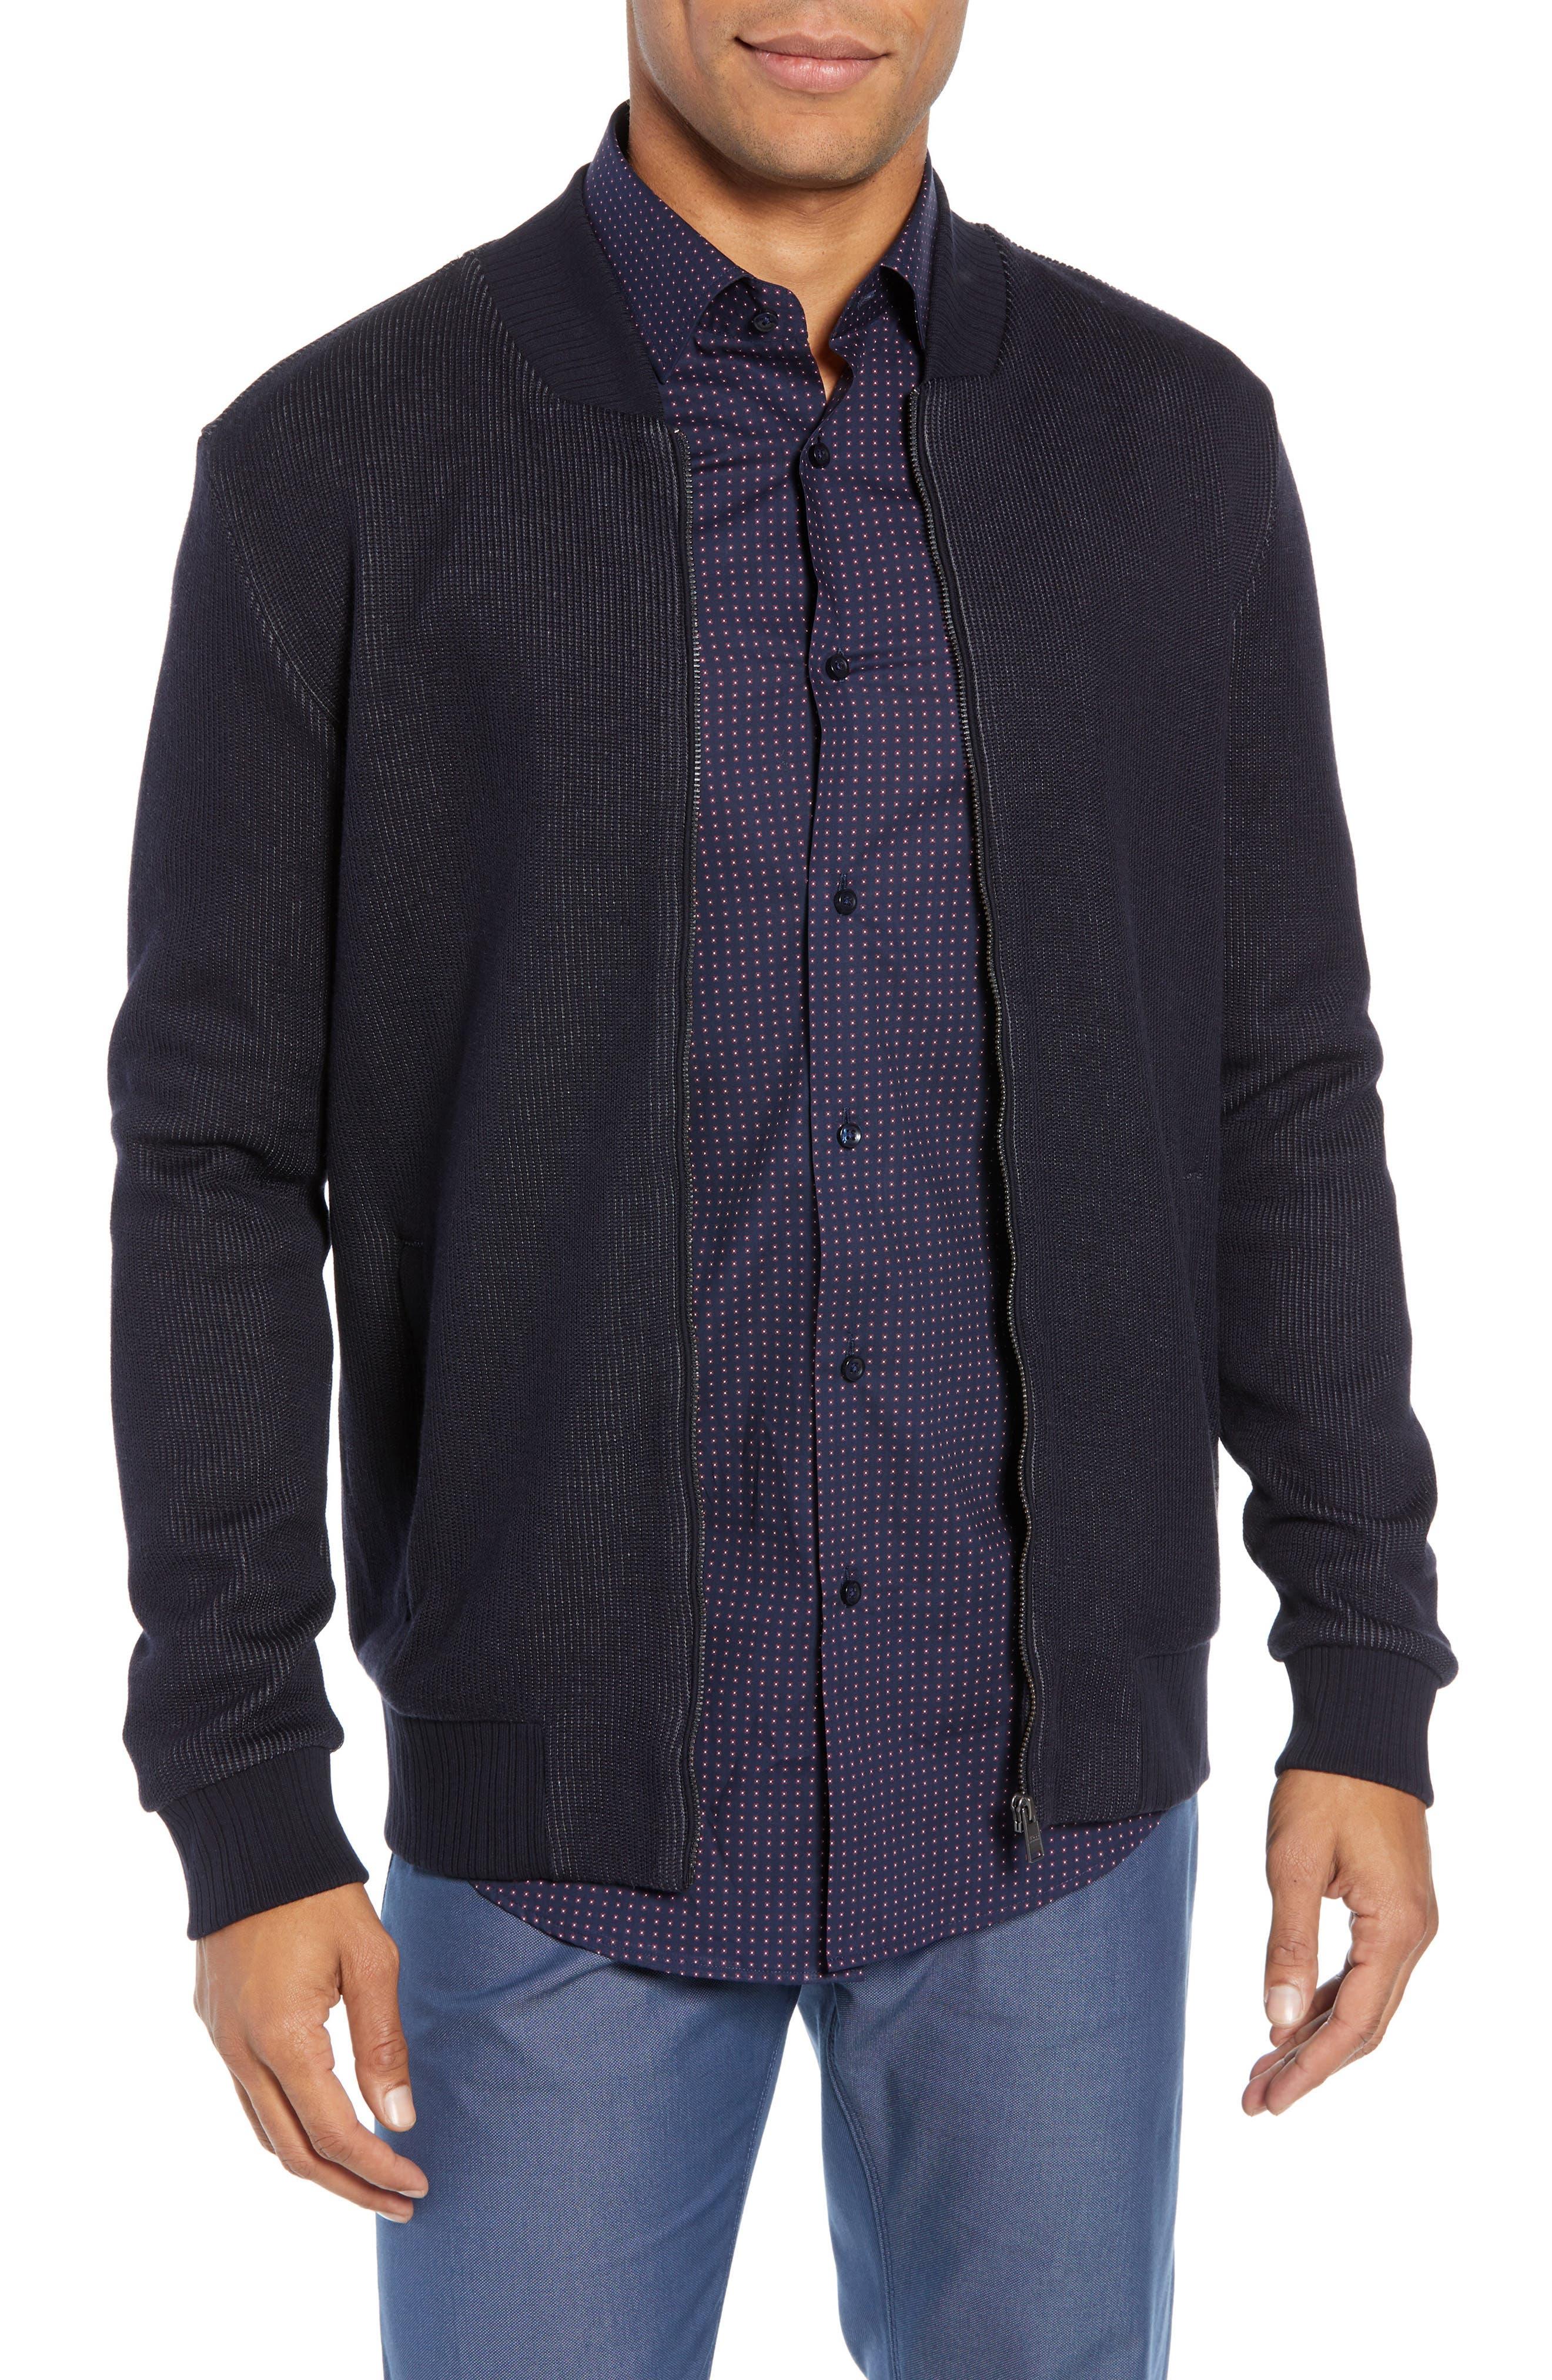 BOSS Salea Slim Fit Sweatshirt Jacket, Main, color, BLUE